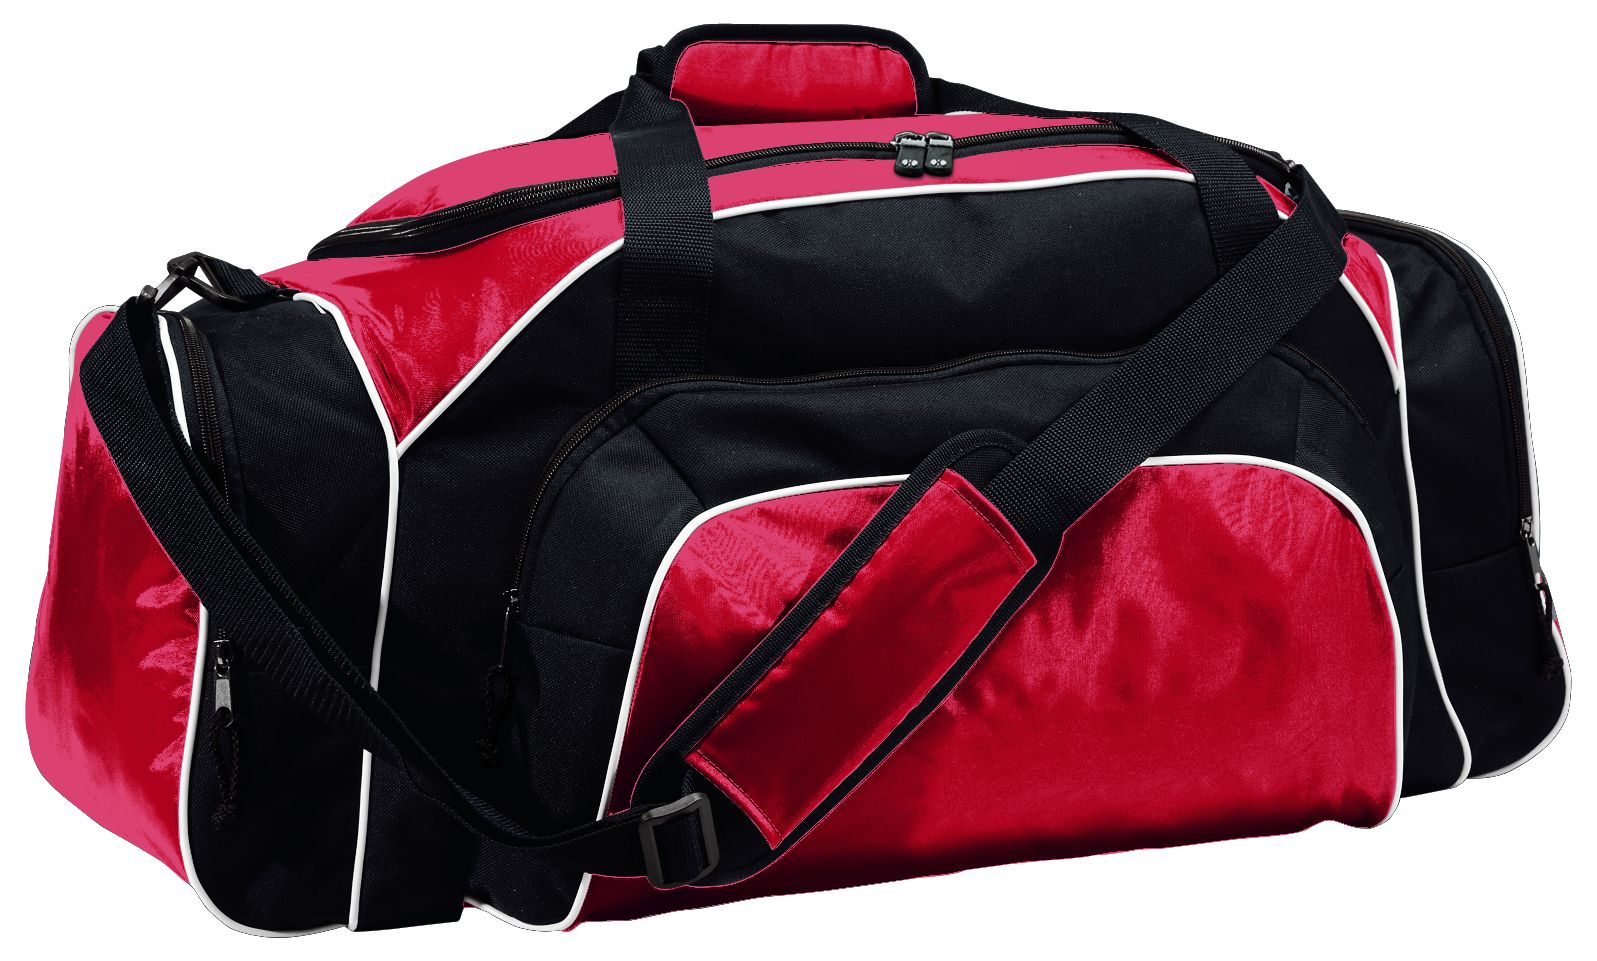 Tournament Duffel Bag - SCARLET/BLACK/WHITE